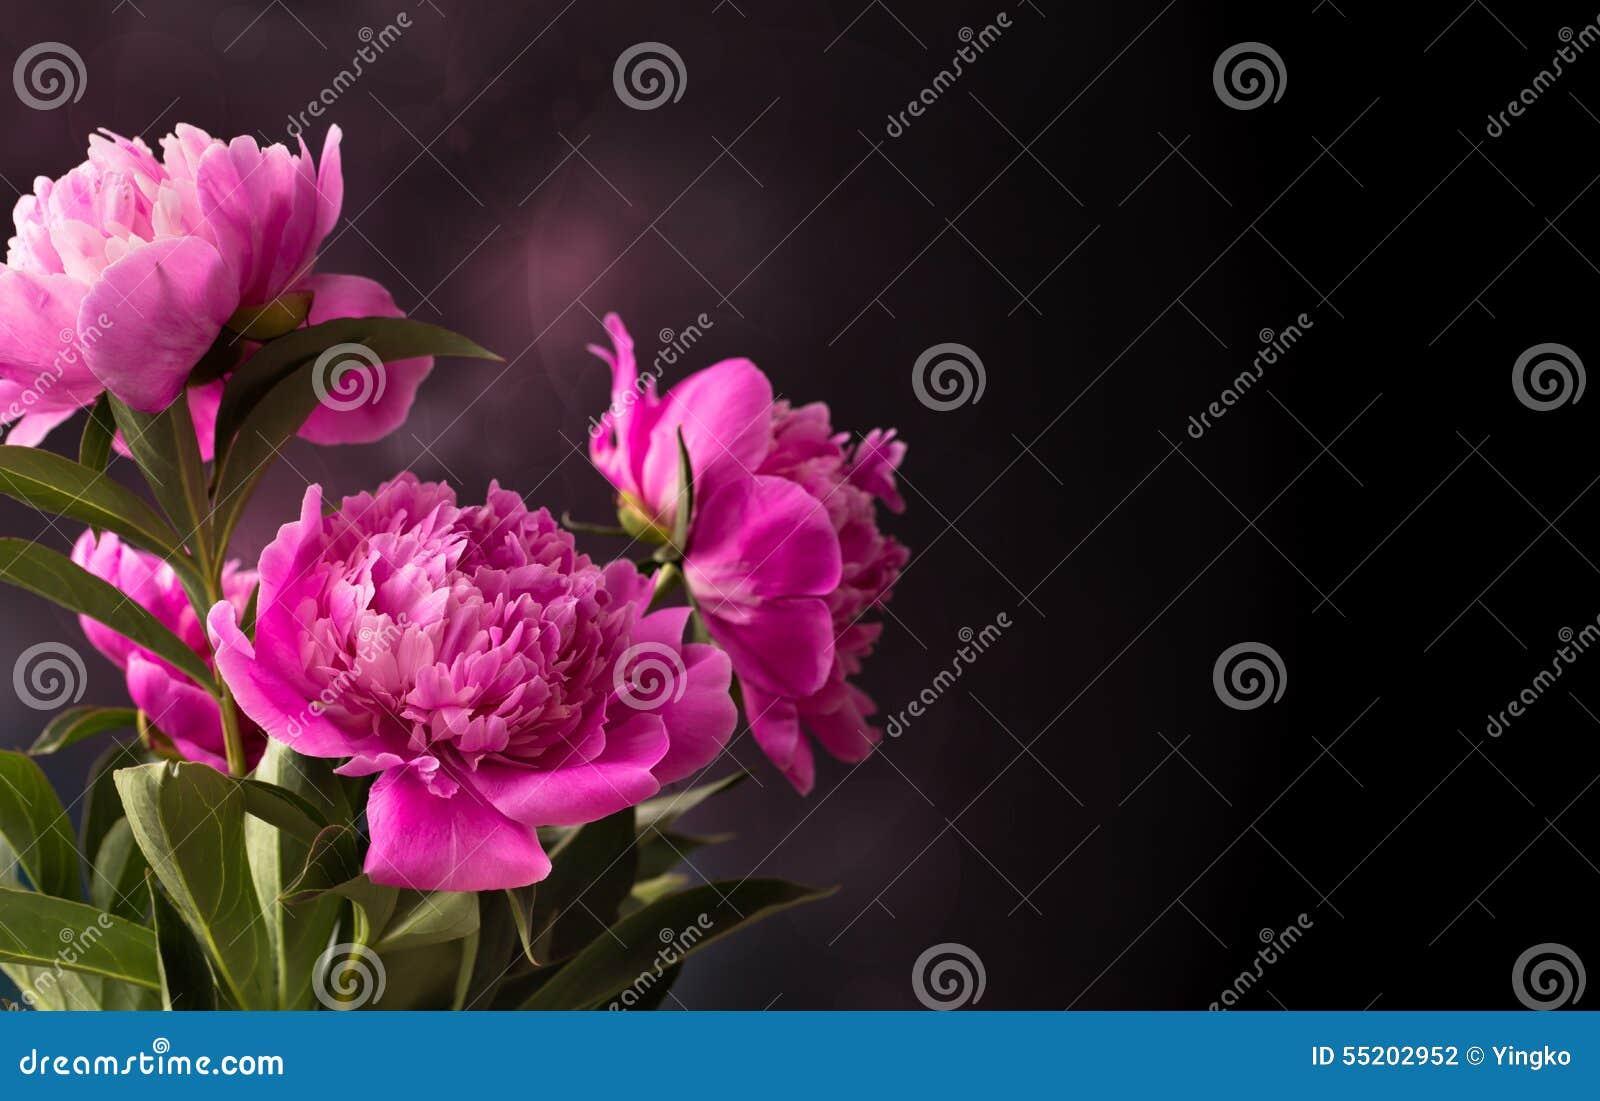 Drie roze pioenbloem op donkere achtergrond